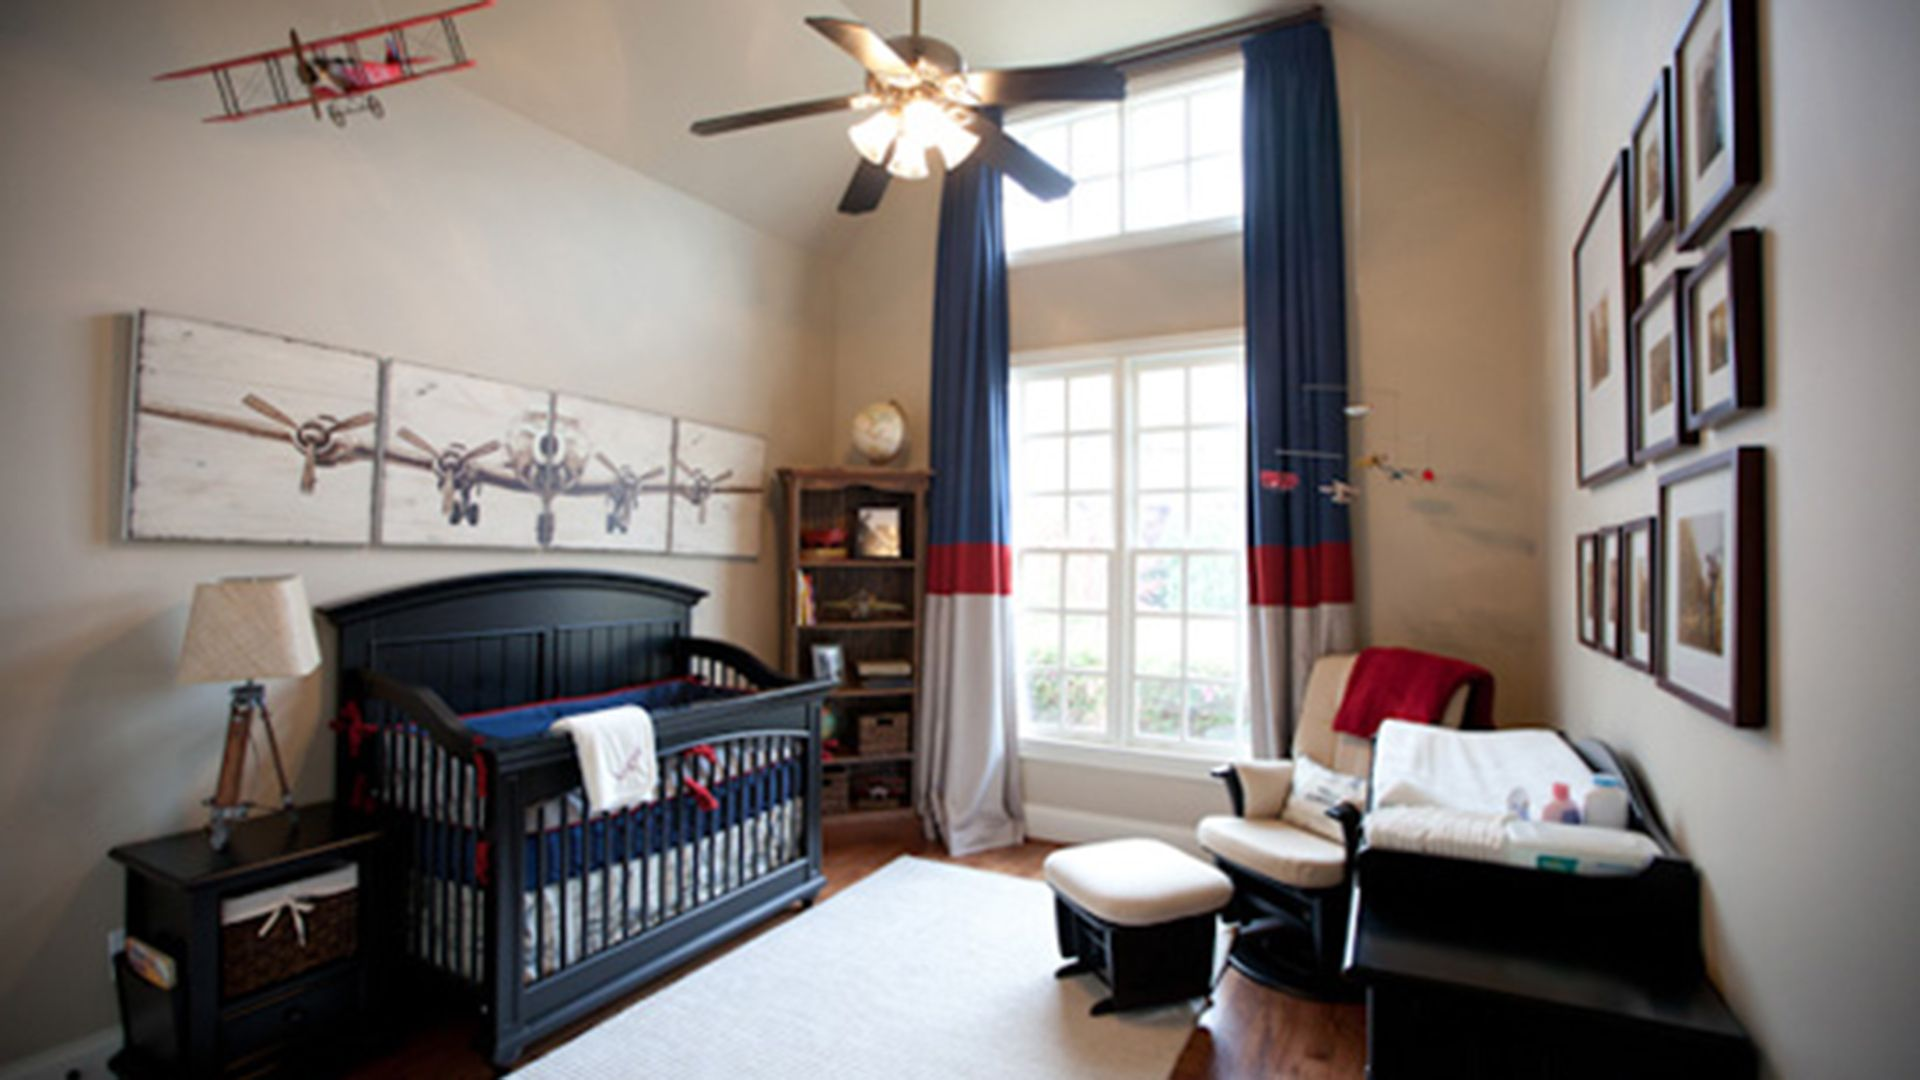 Make Way For Baby 11 Boy Nursery Ideas From Pinterest Baby Boy Room Nursery Beautiful Nursery Room Nursery Room Boy